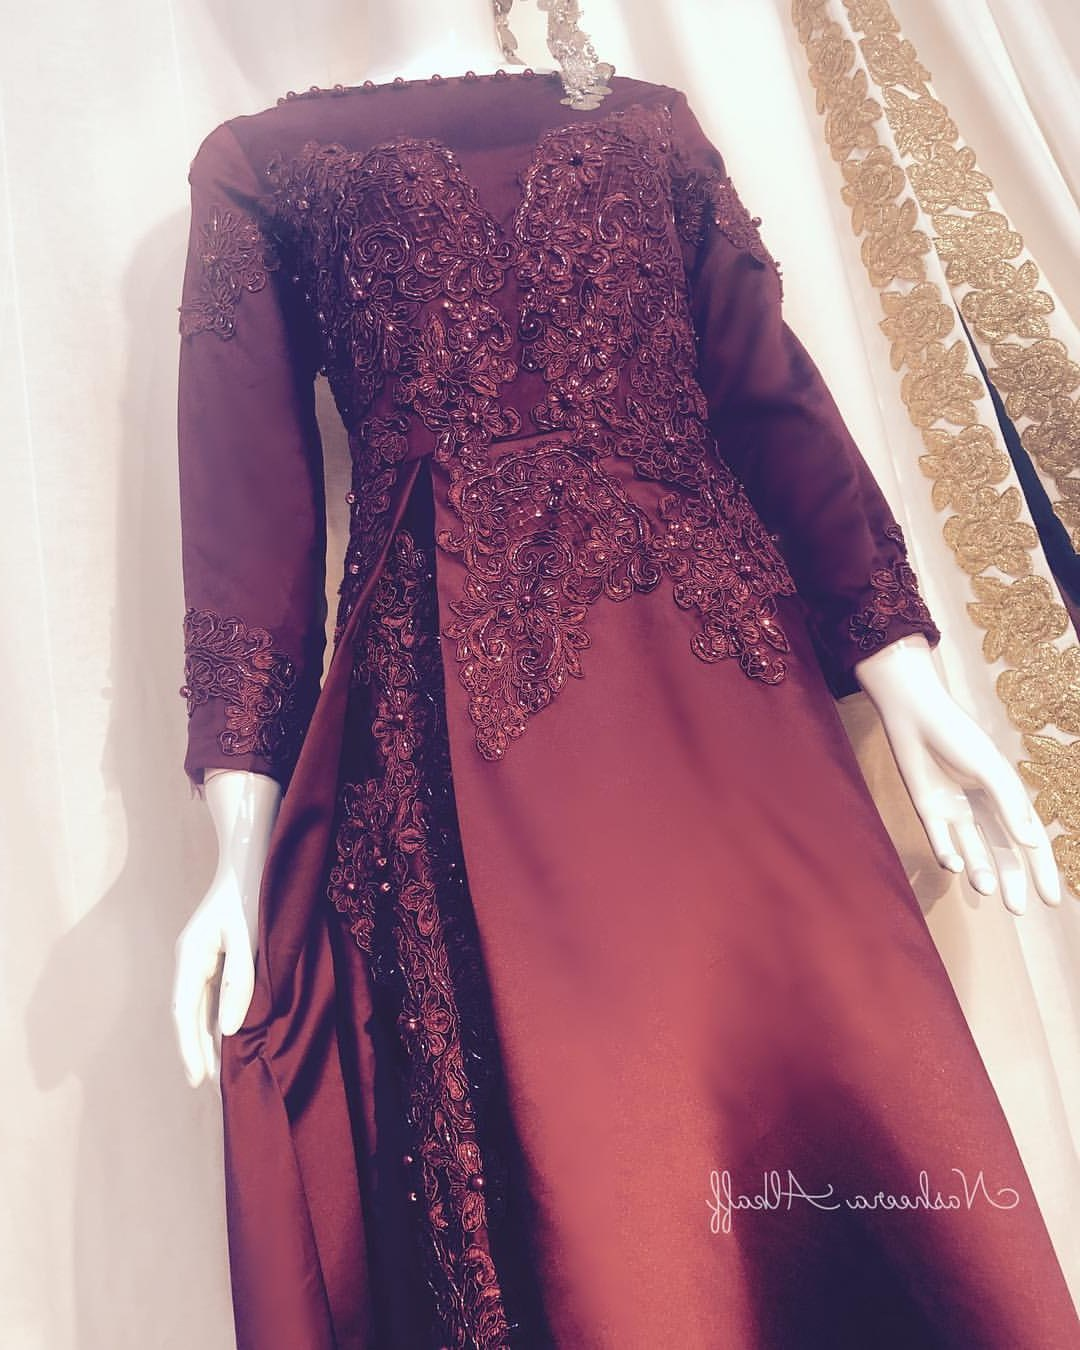 Ide Design Baju Pengantin Muslimah 9ddf Singaporebridaltailor Instagram S and Videos